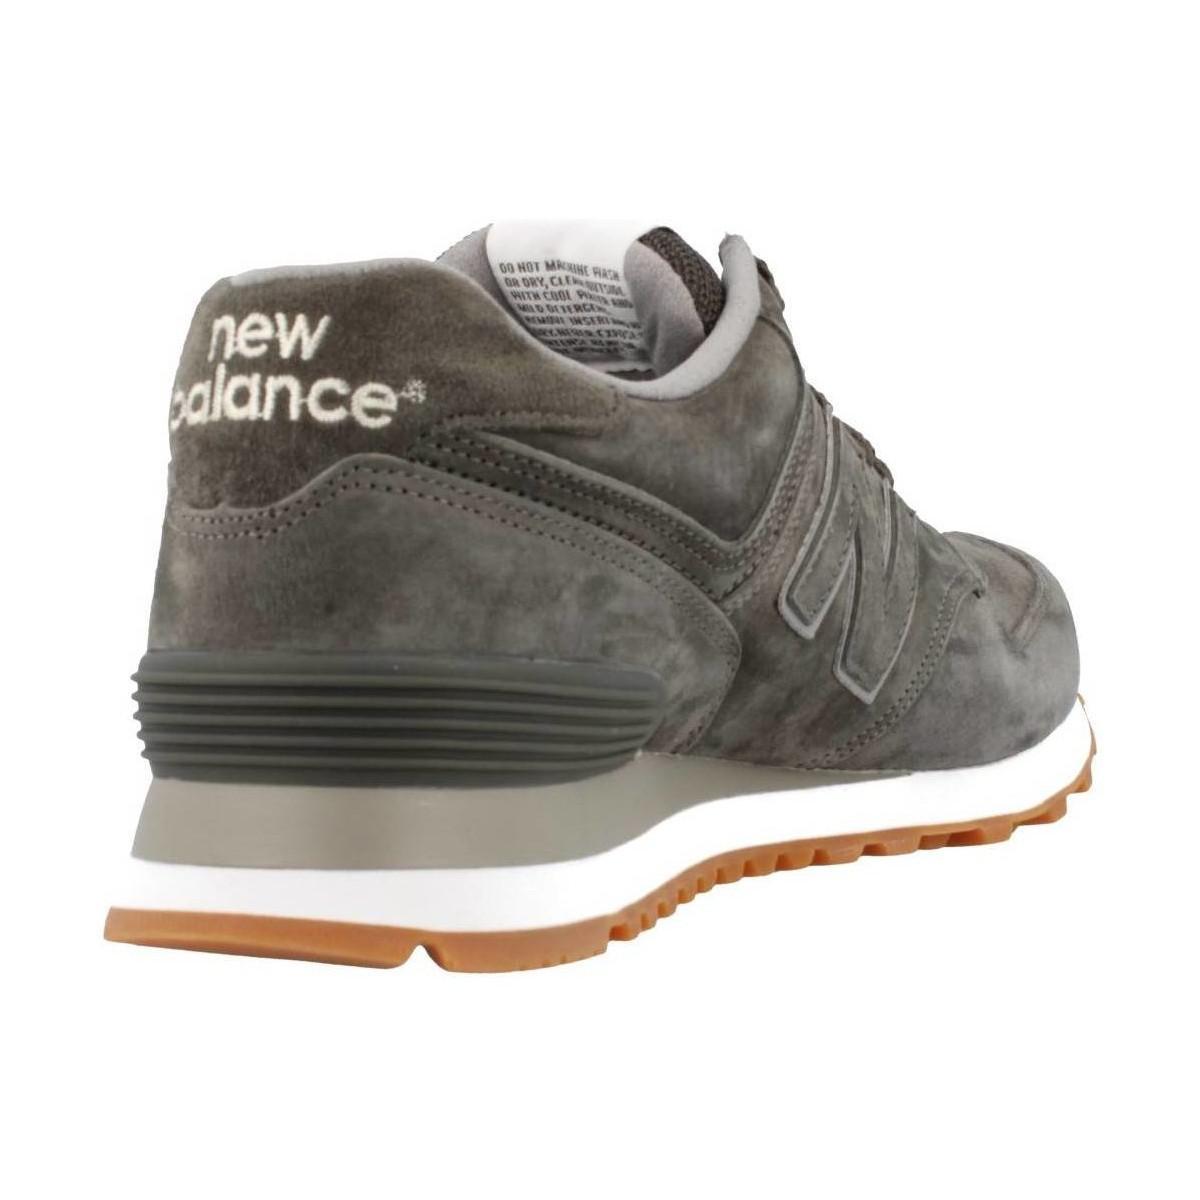 new balance ml574fsc